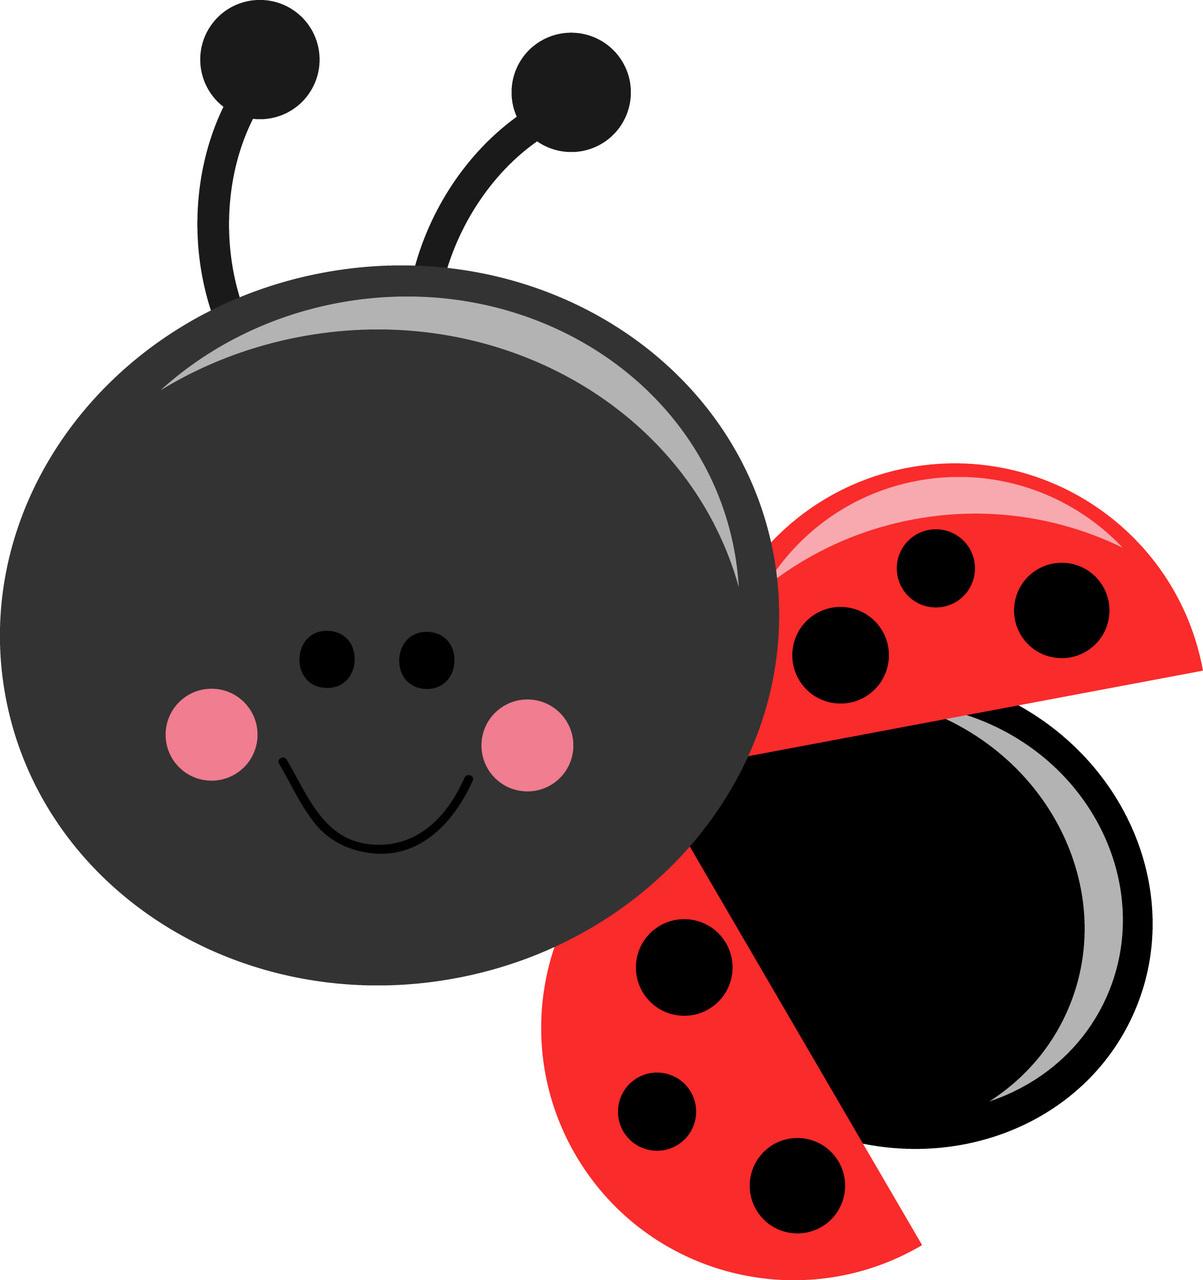 Ladybug Clipart - Clipart Kid